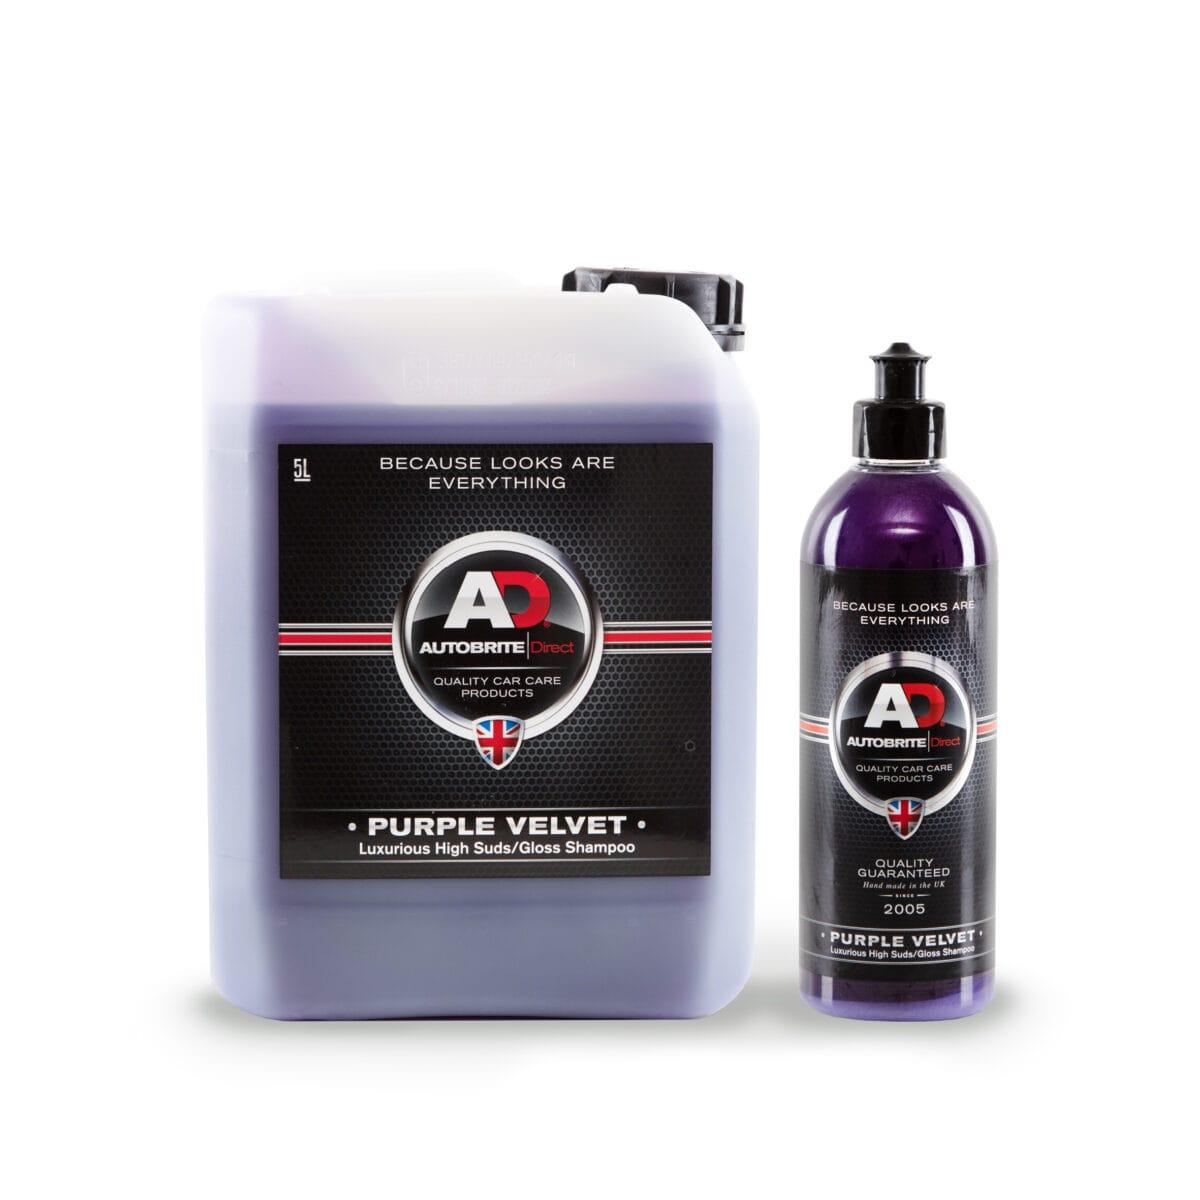 purple velvet car shampoo